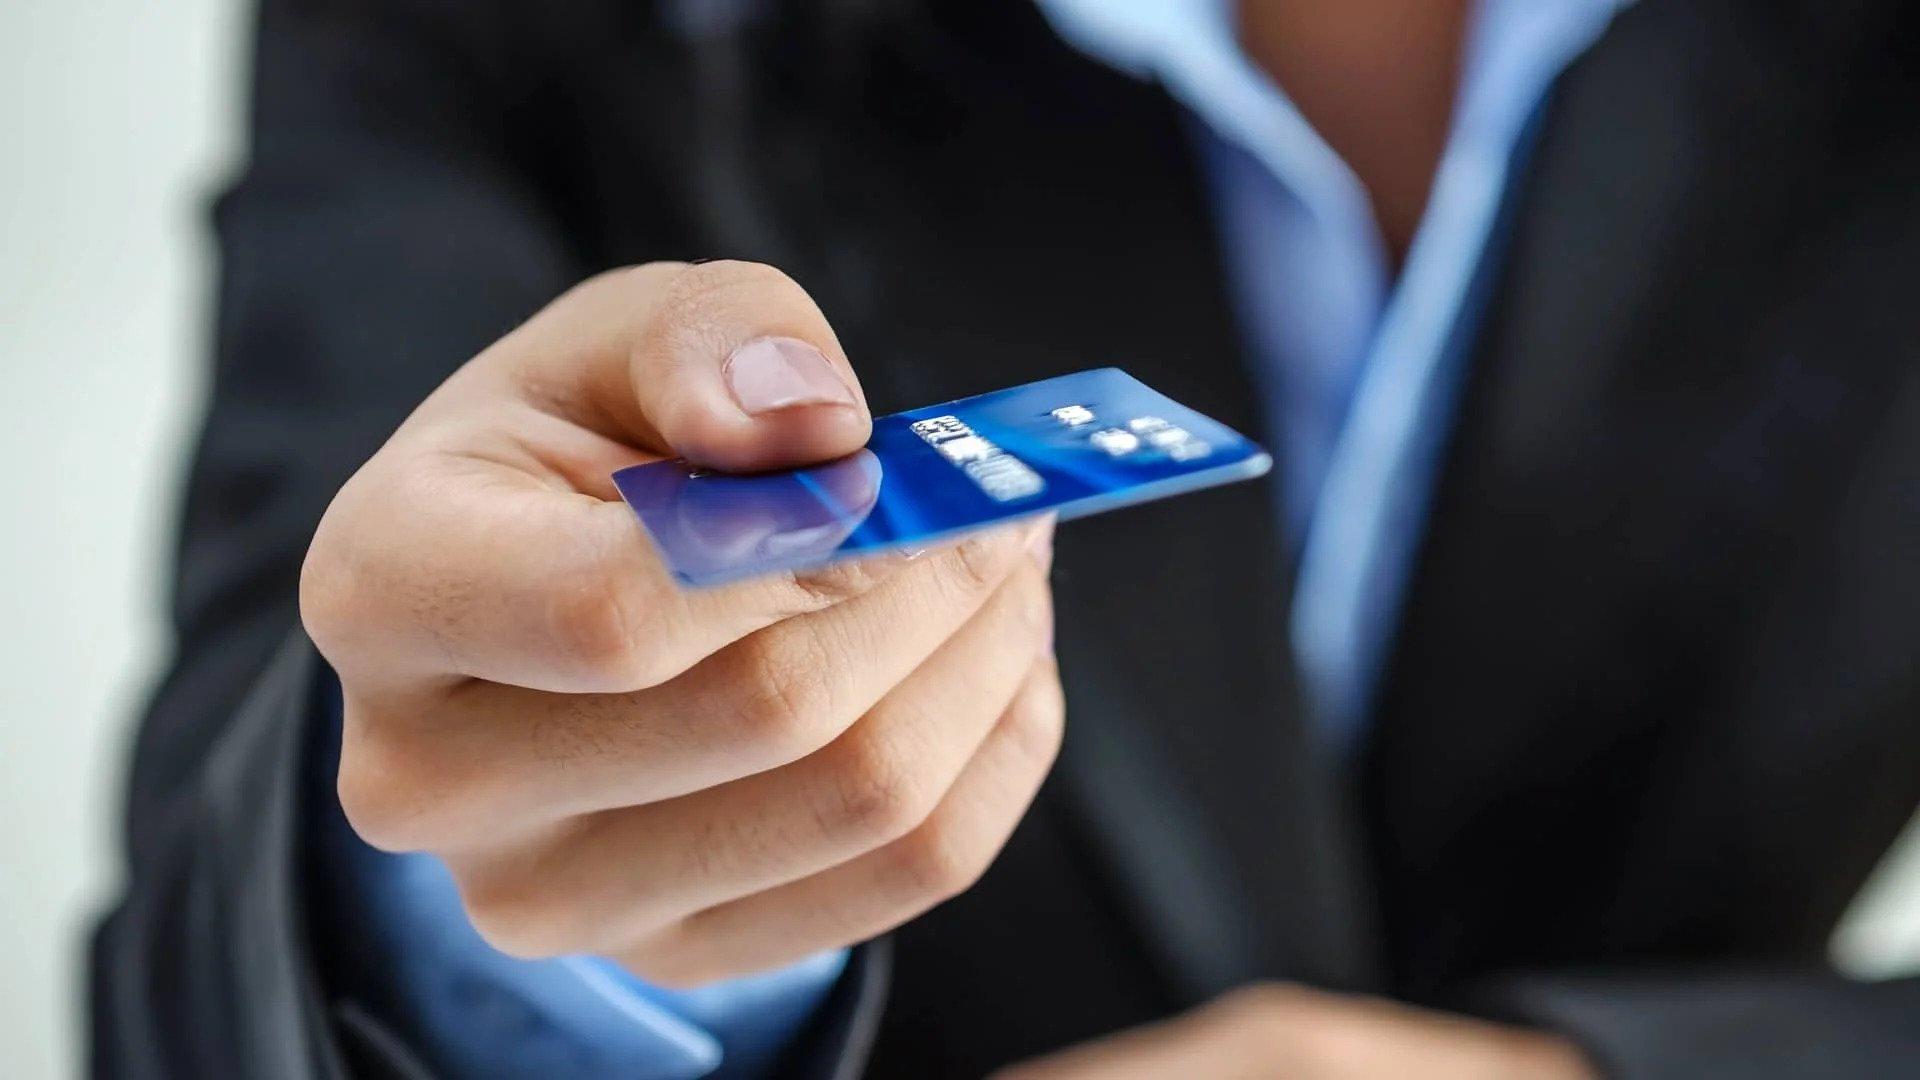 Банк пенсионный кредит онлайн